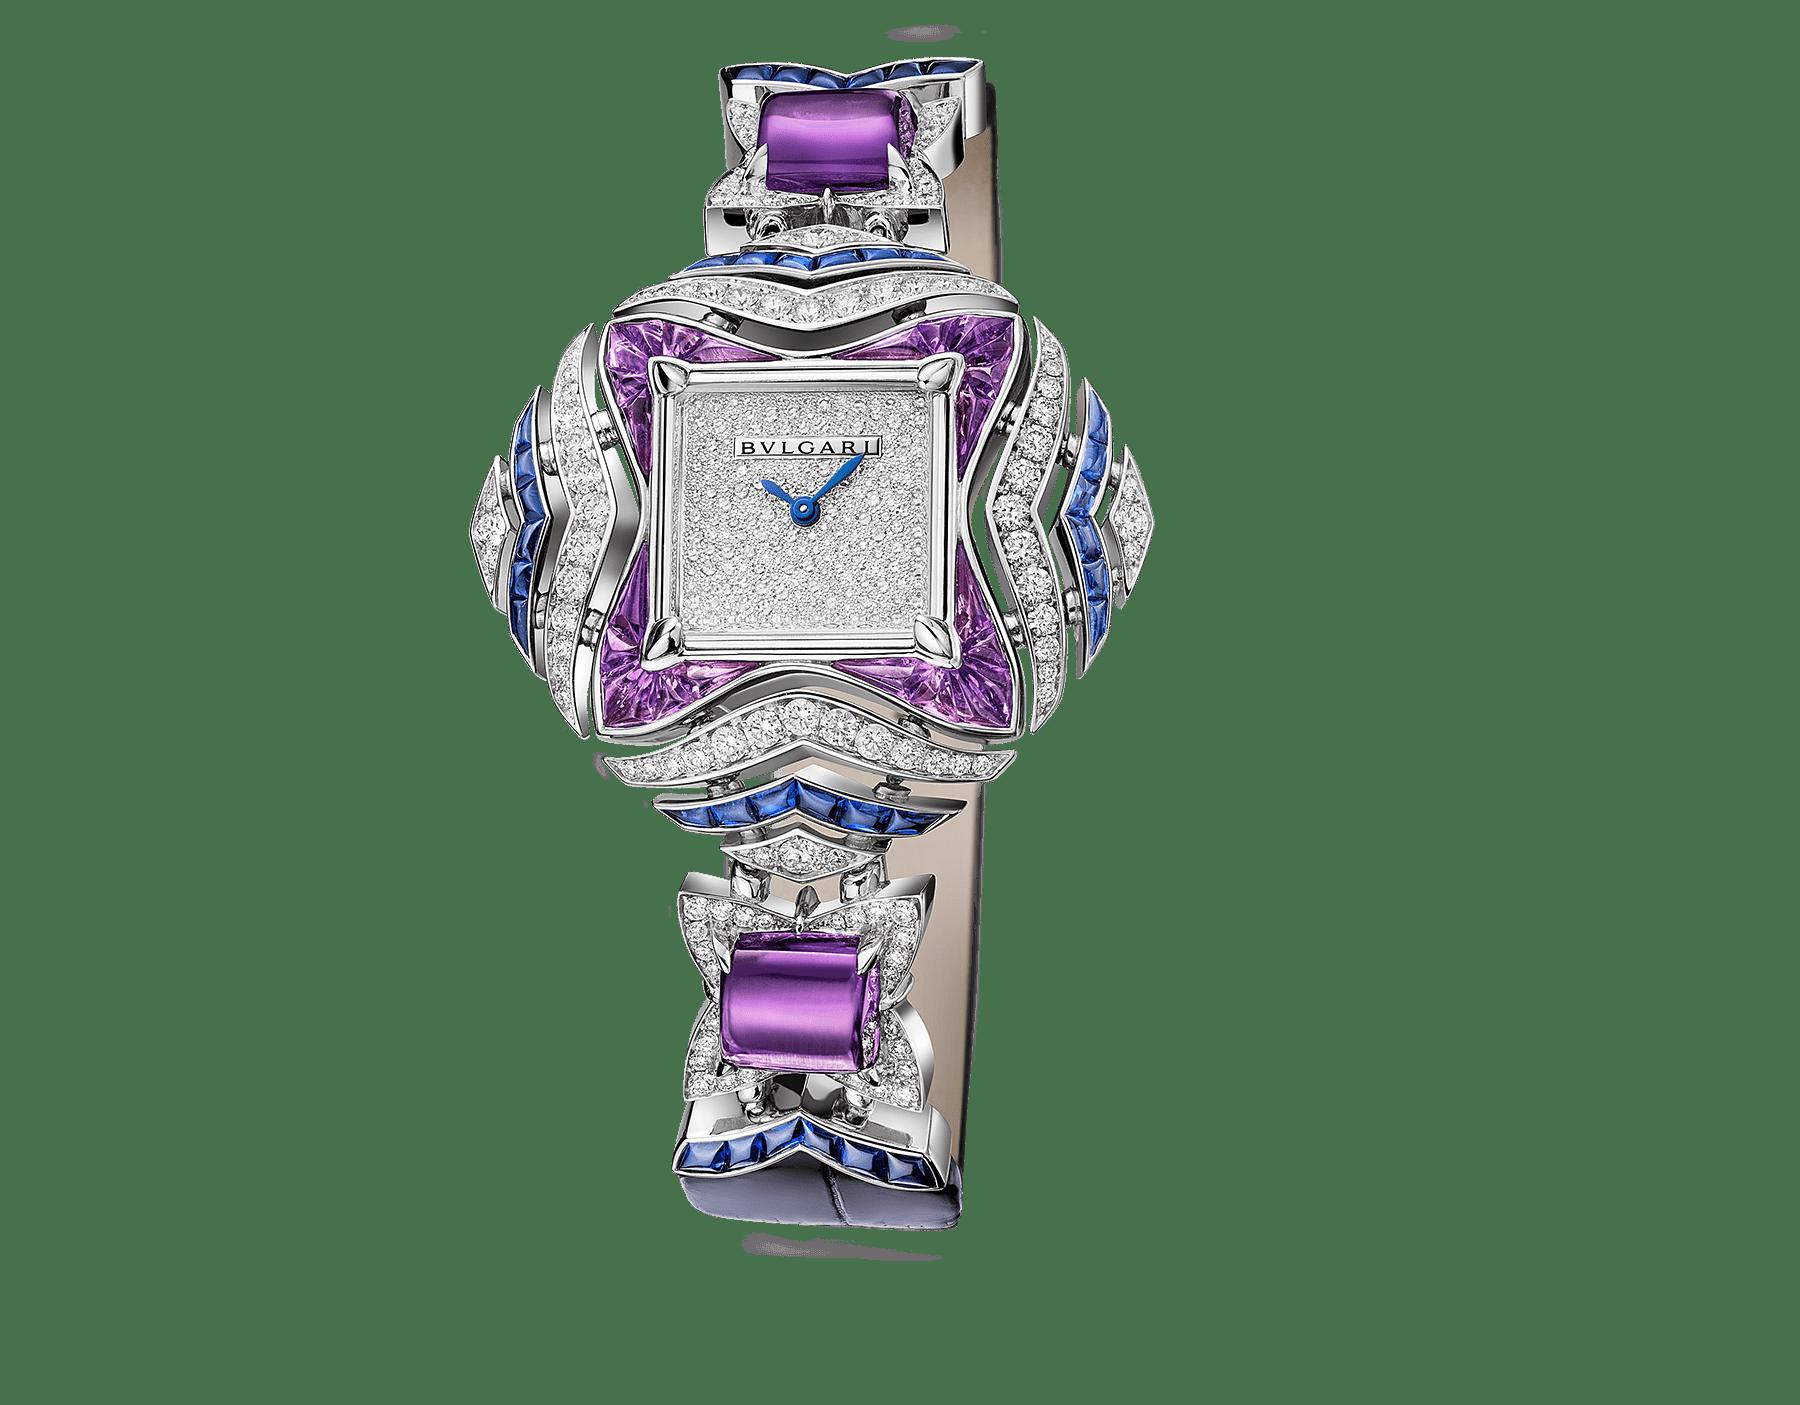 MVSA 腕錶,18K 白金錶殼和連接扣鑲飾明亮型切割鑽石、面包型切割藍寶石、面包型和蛋面型切割紫水晶。雪花式密鑲鑽石錶盤,藍色鱷魚皮錶帶。 102244 image 1